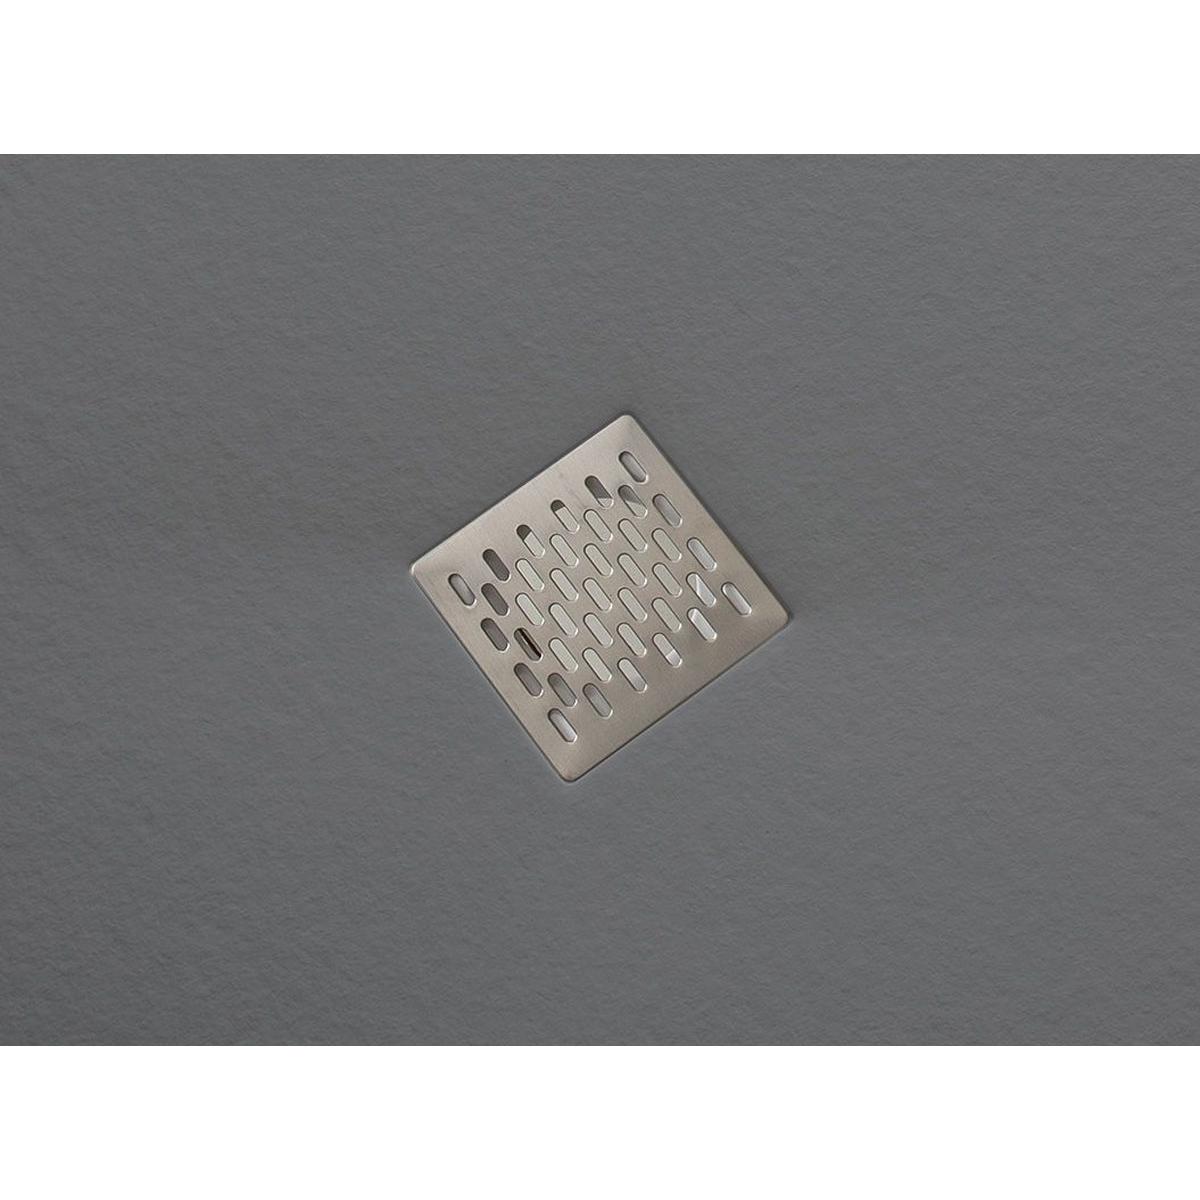 Plato de ducha rectangular 100x80 Coliseo Stone Nox Cemento